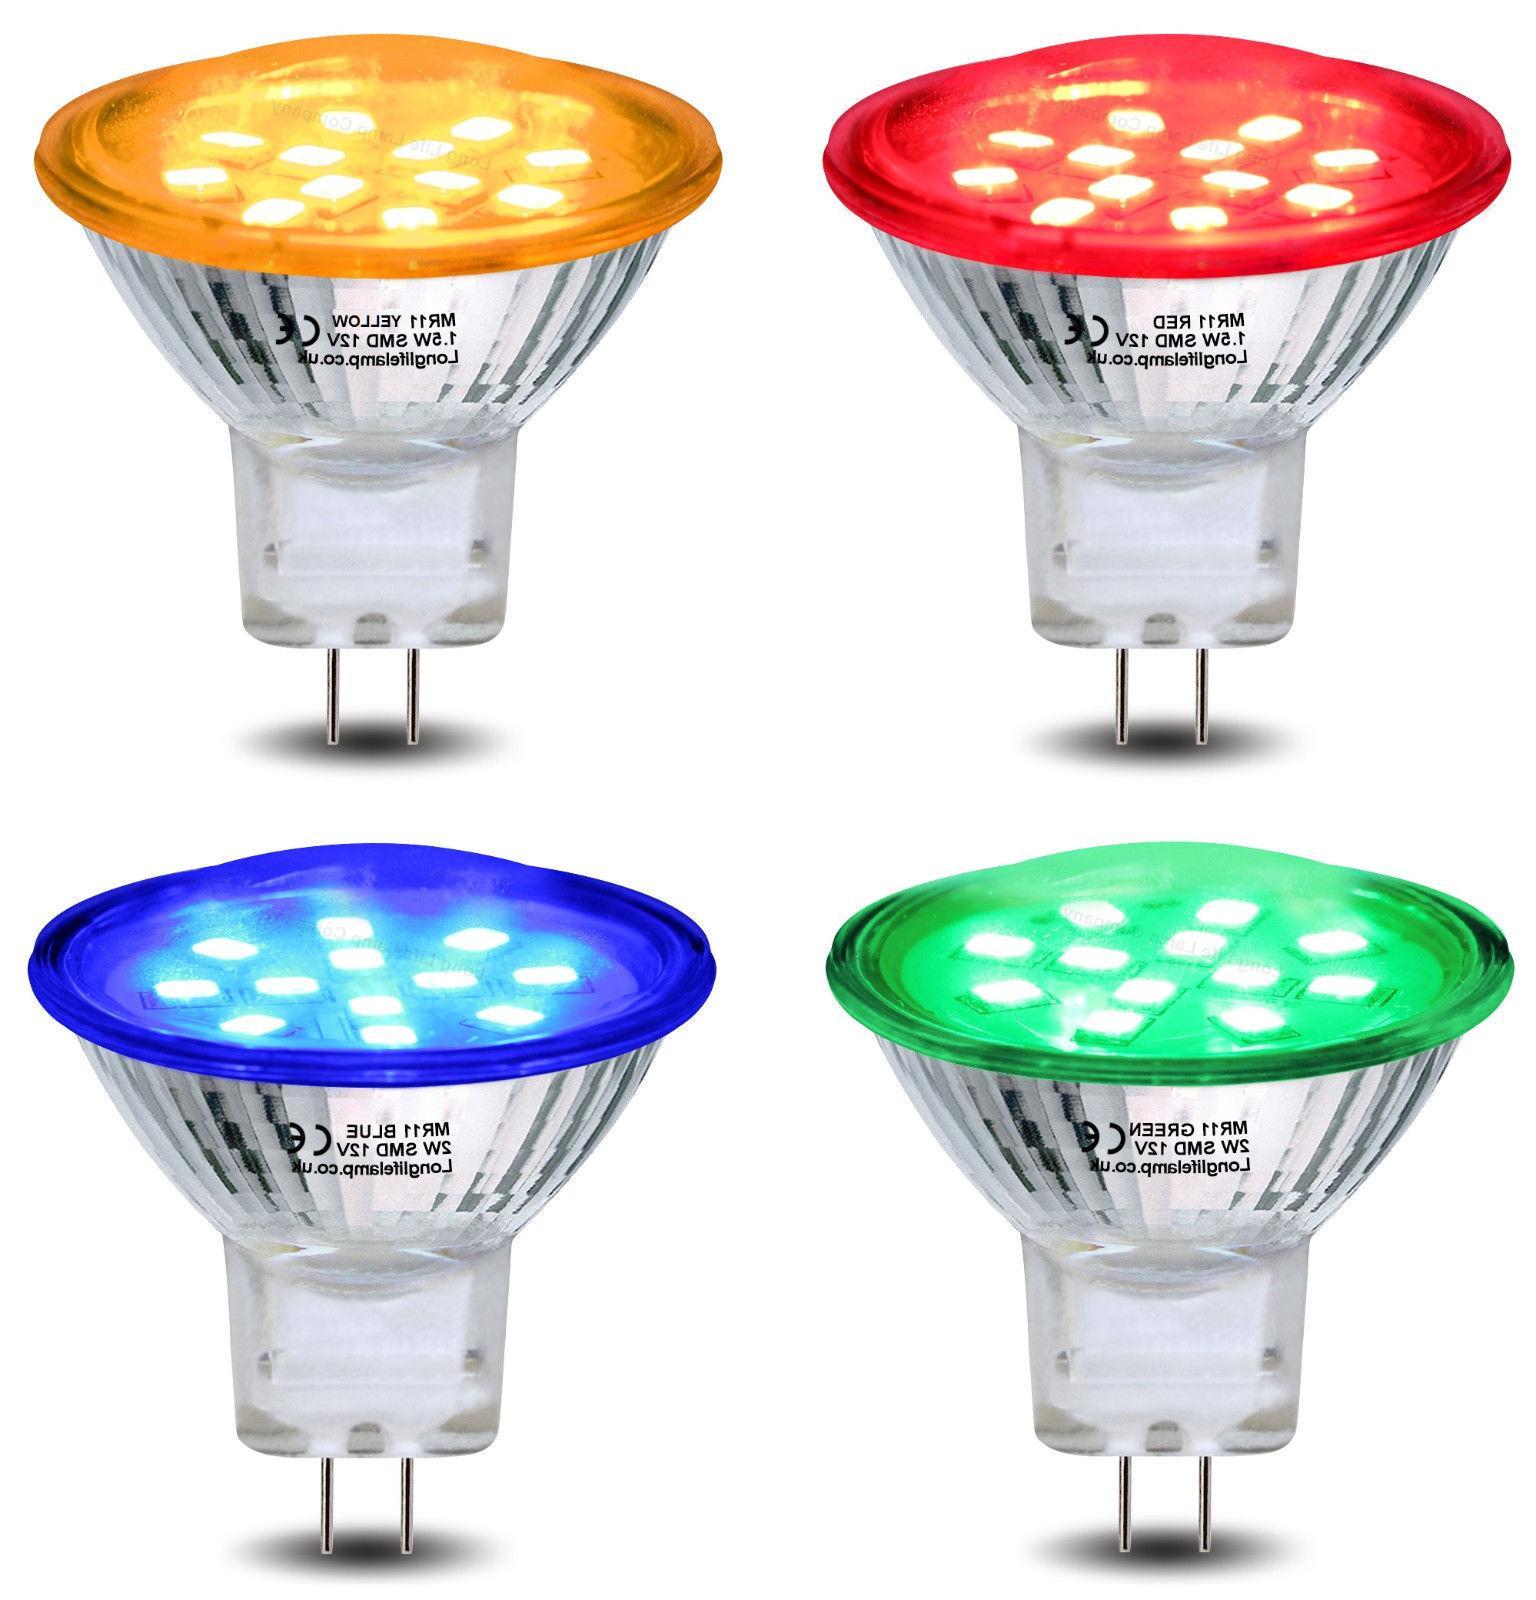 Red Green Blue Yellow 12V LED MR11 Low Voltage Light Bulb GU